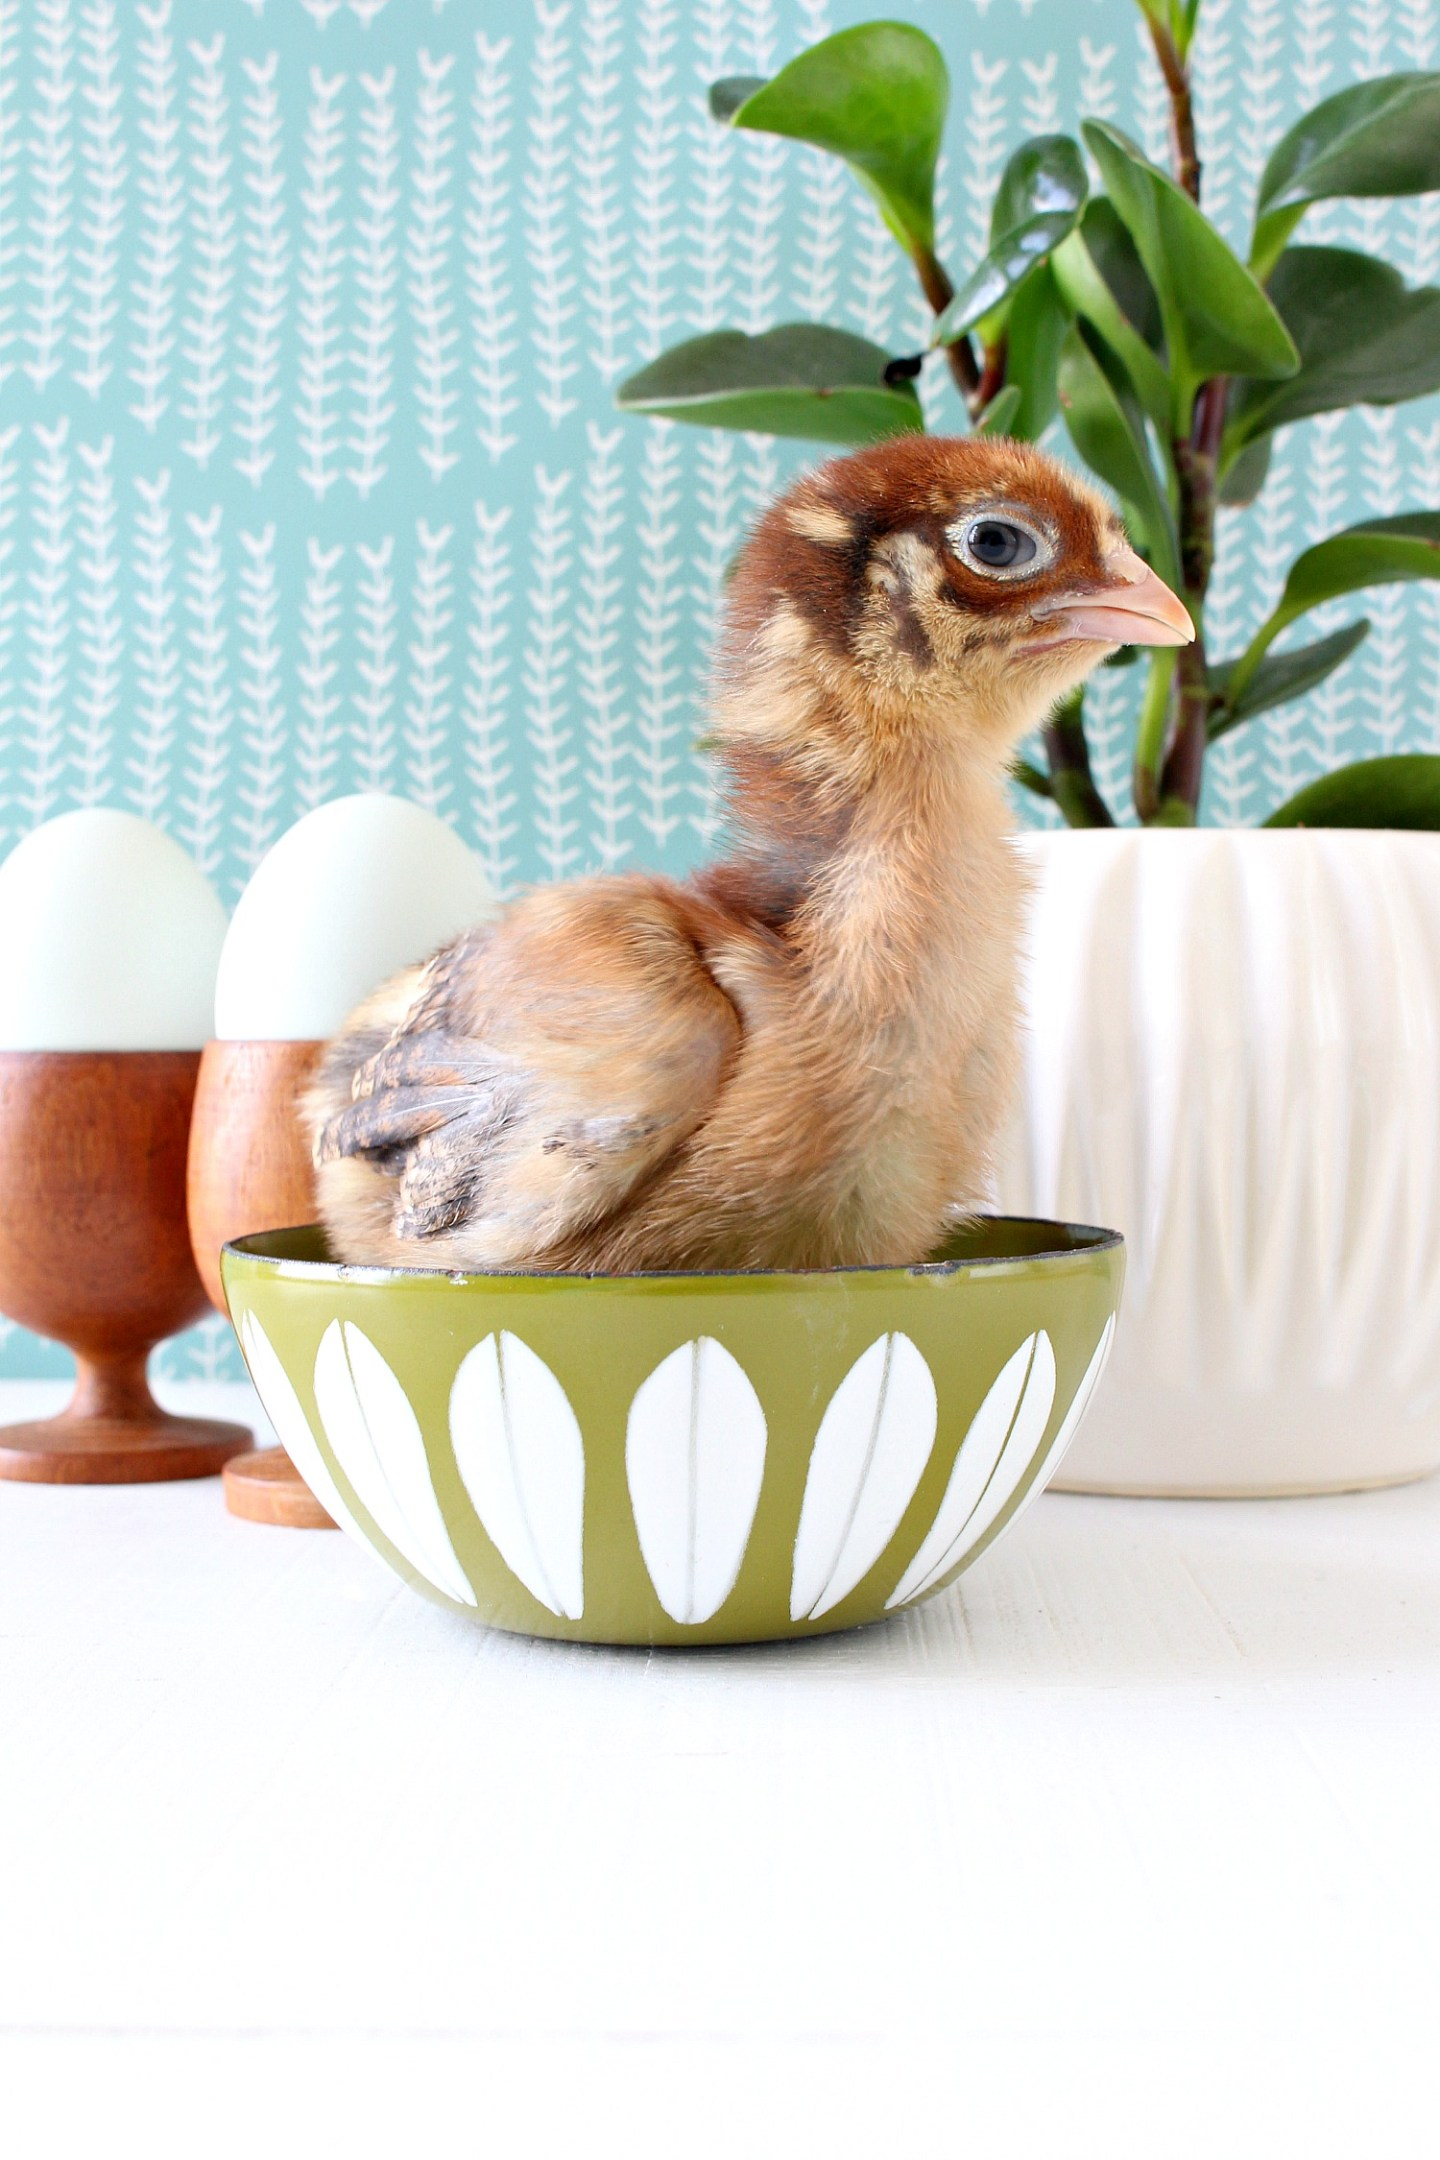 Baby Chicken in Cathrineholm Bowl